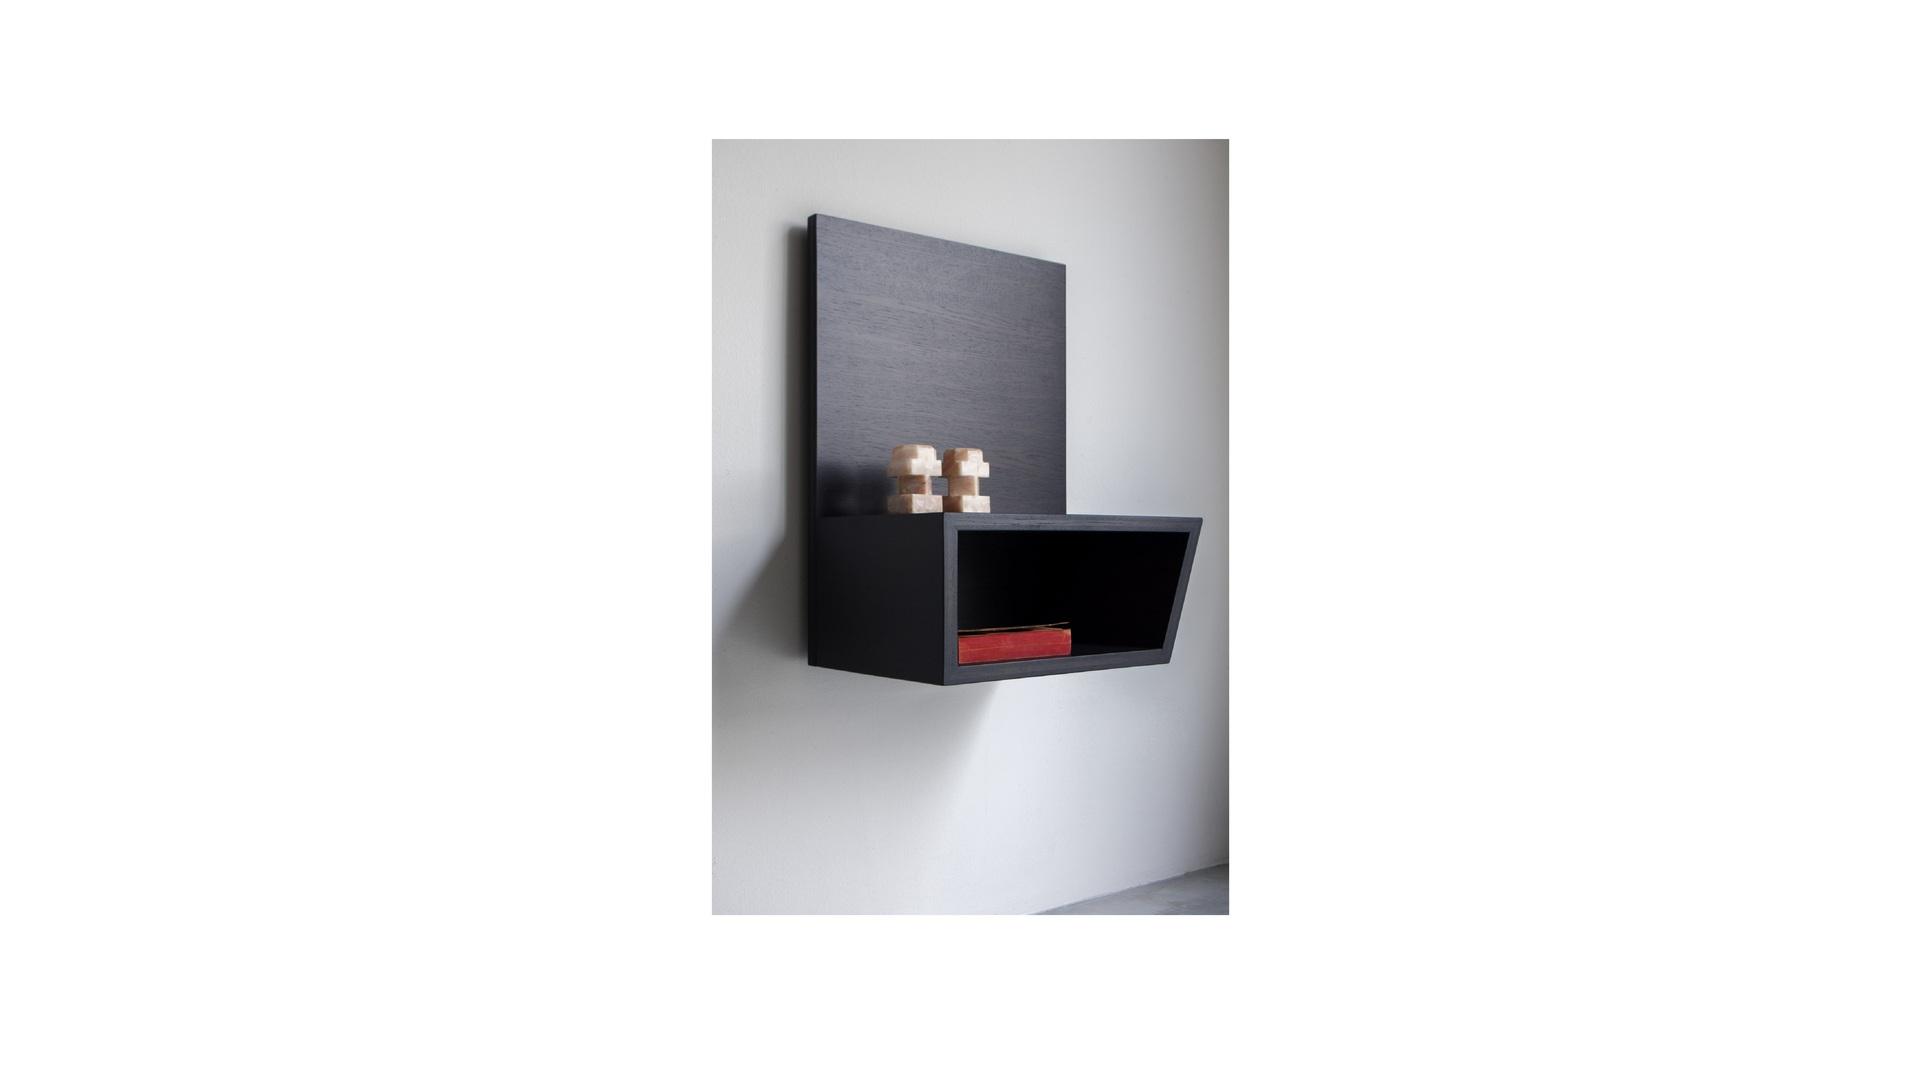 Ply-wall-unit-small-1365x2048.jpg 1.jpg